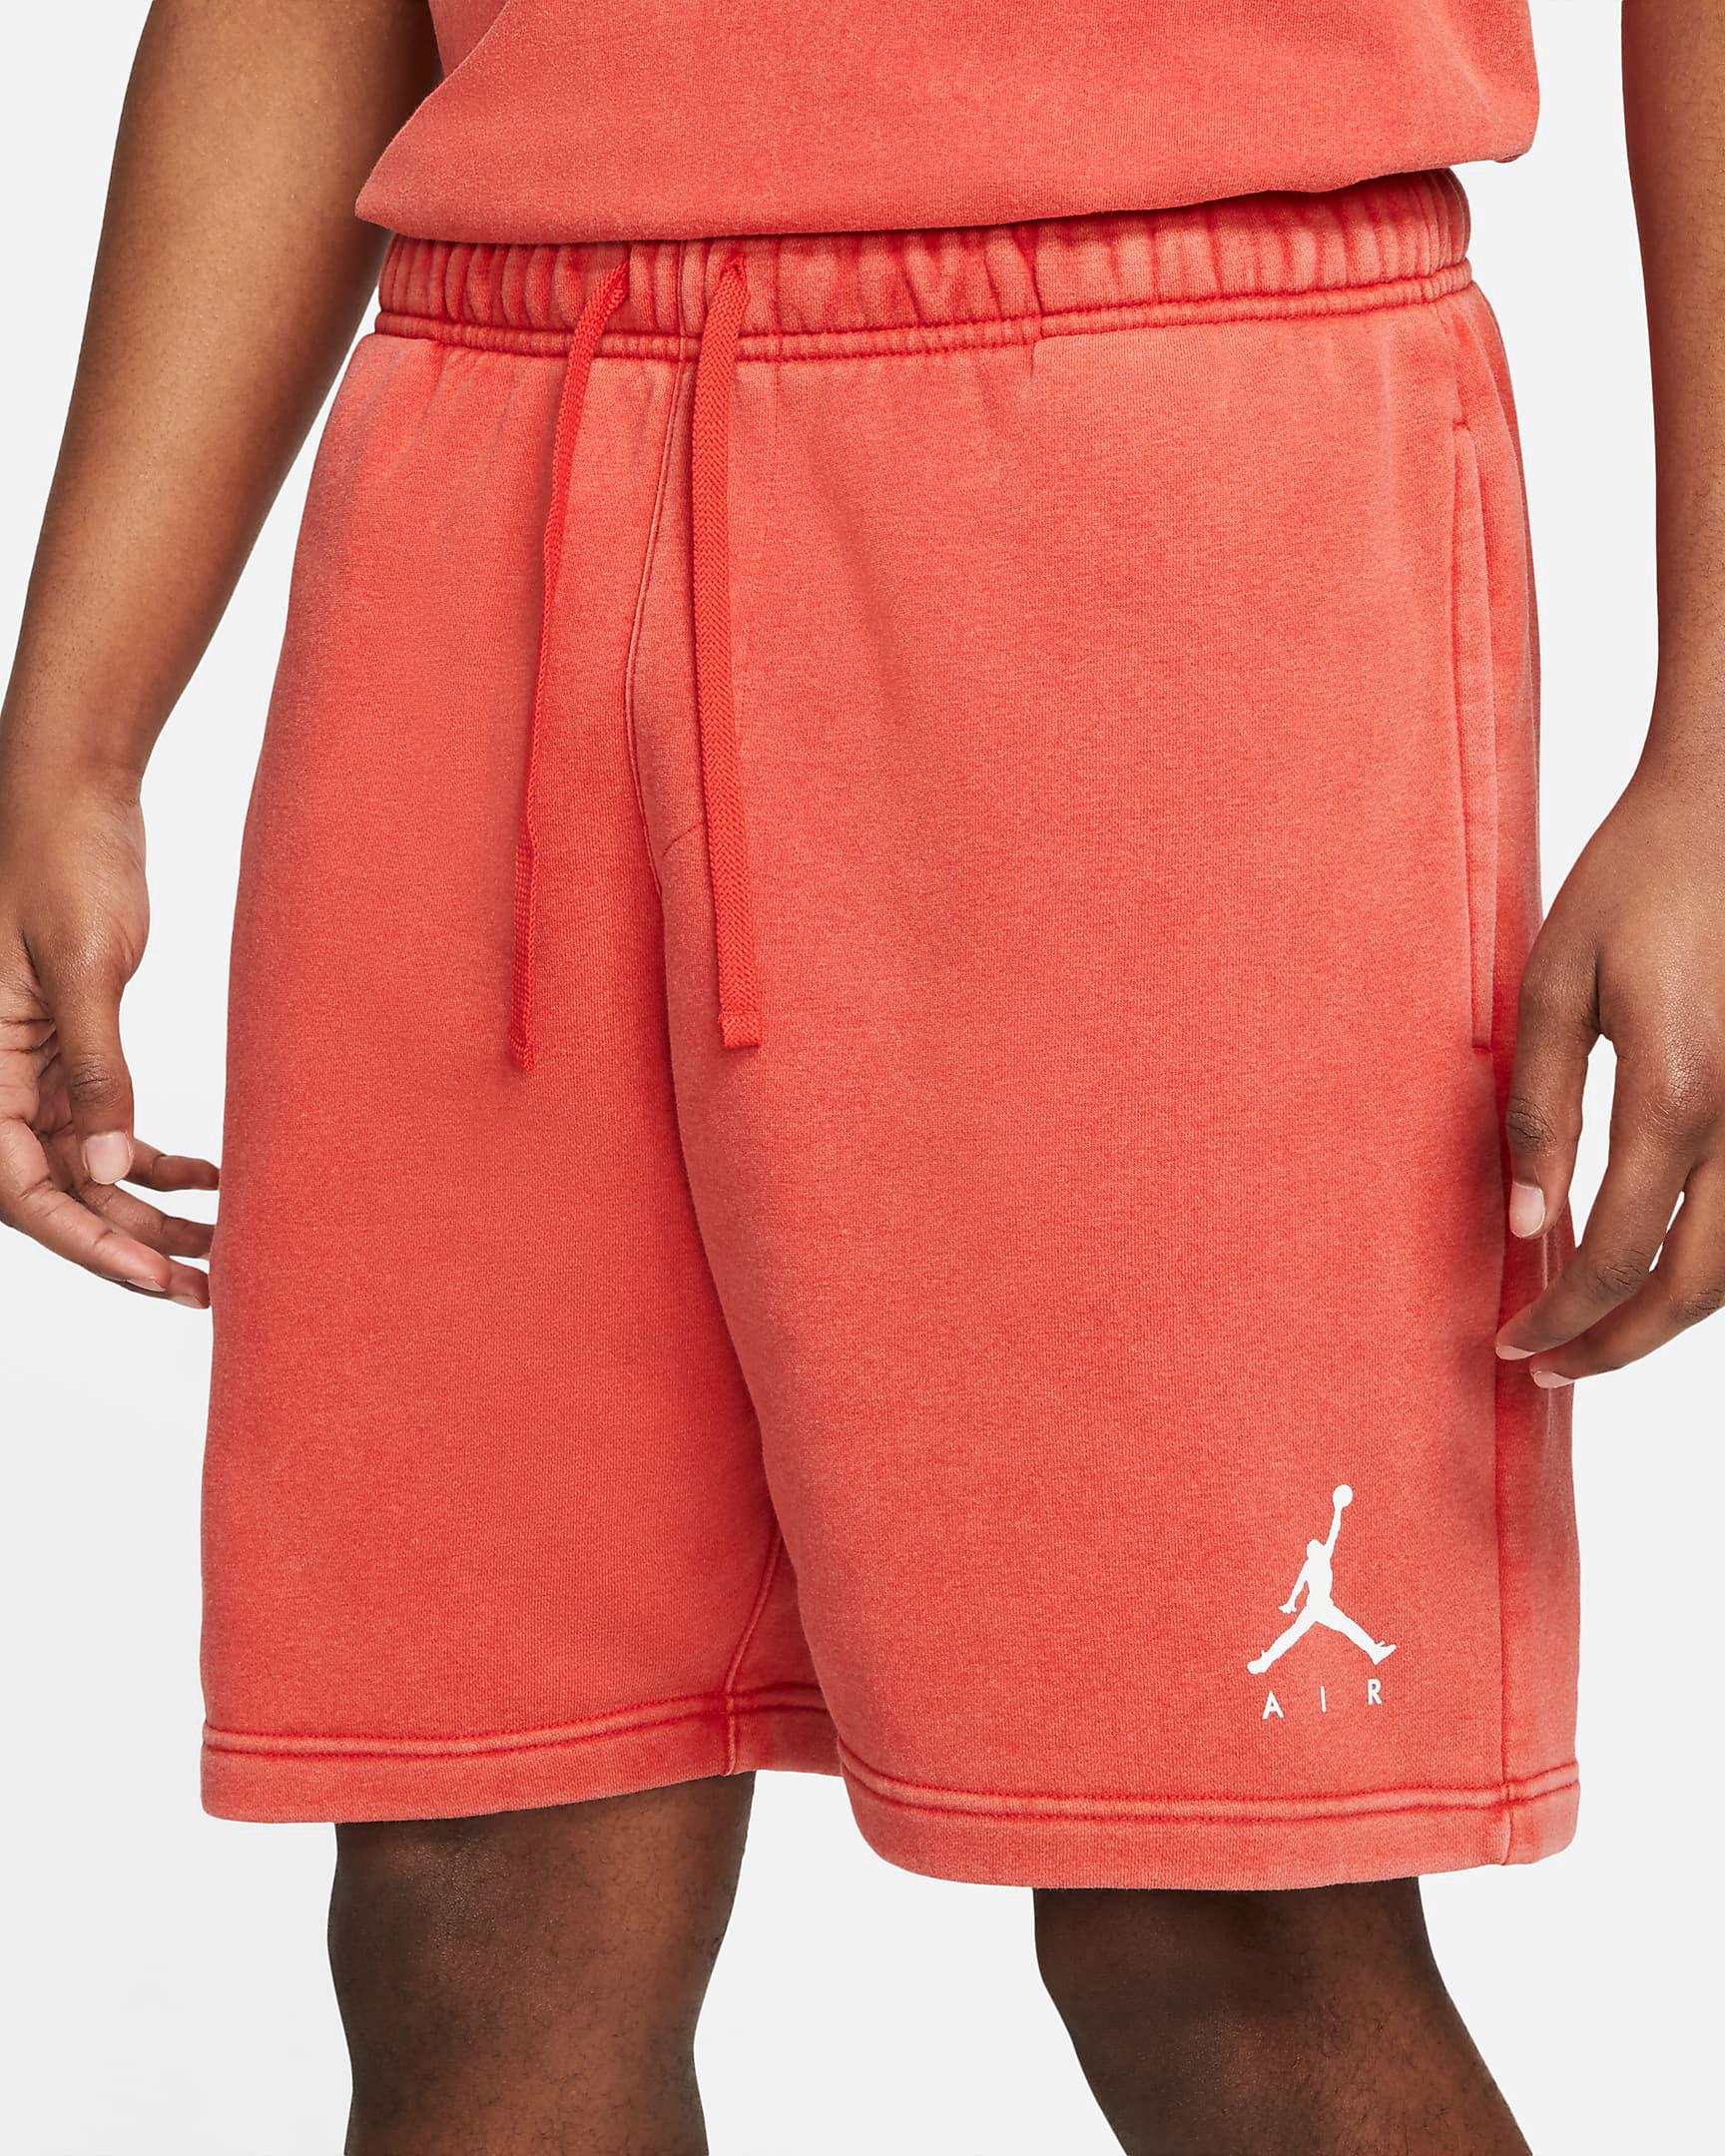 jordan-4-taupe-haze-infrared-shorts-1